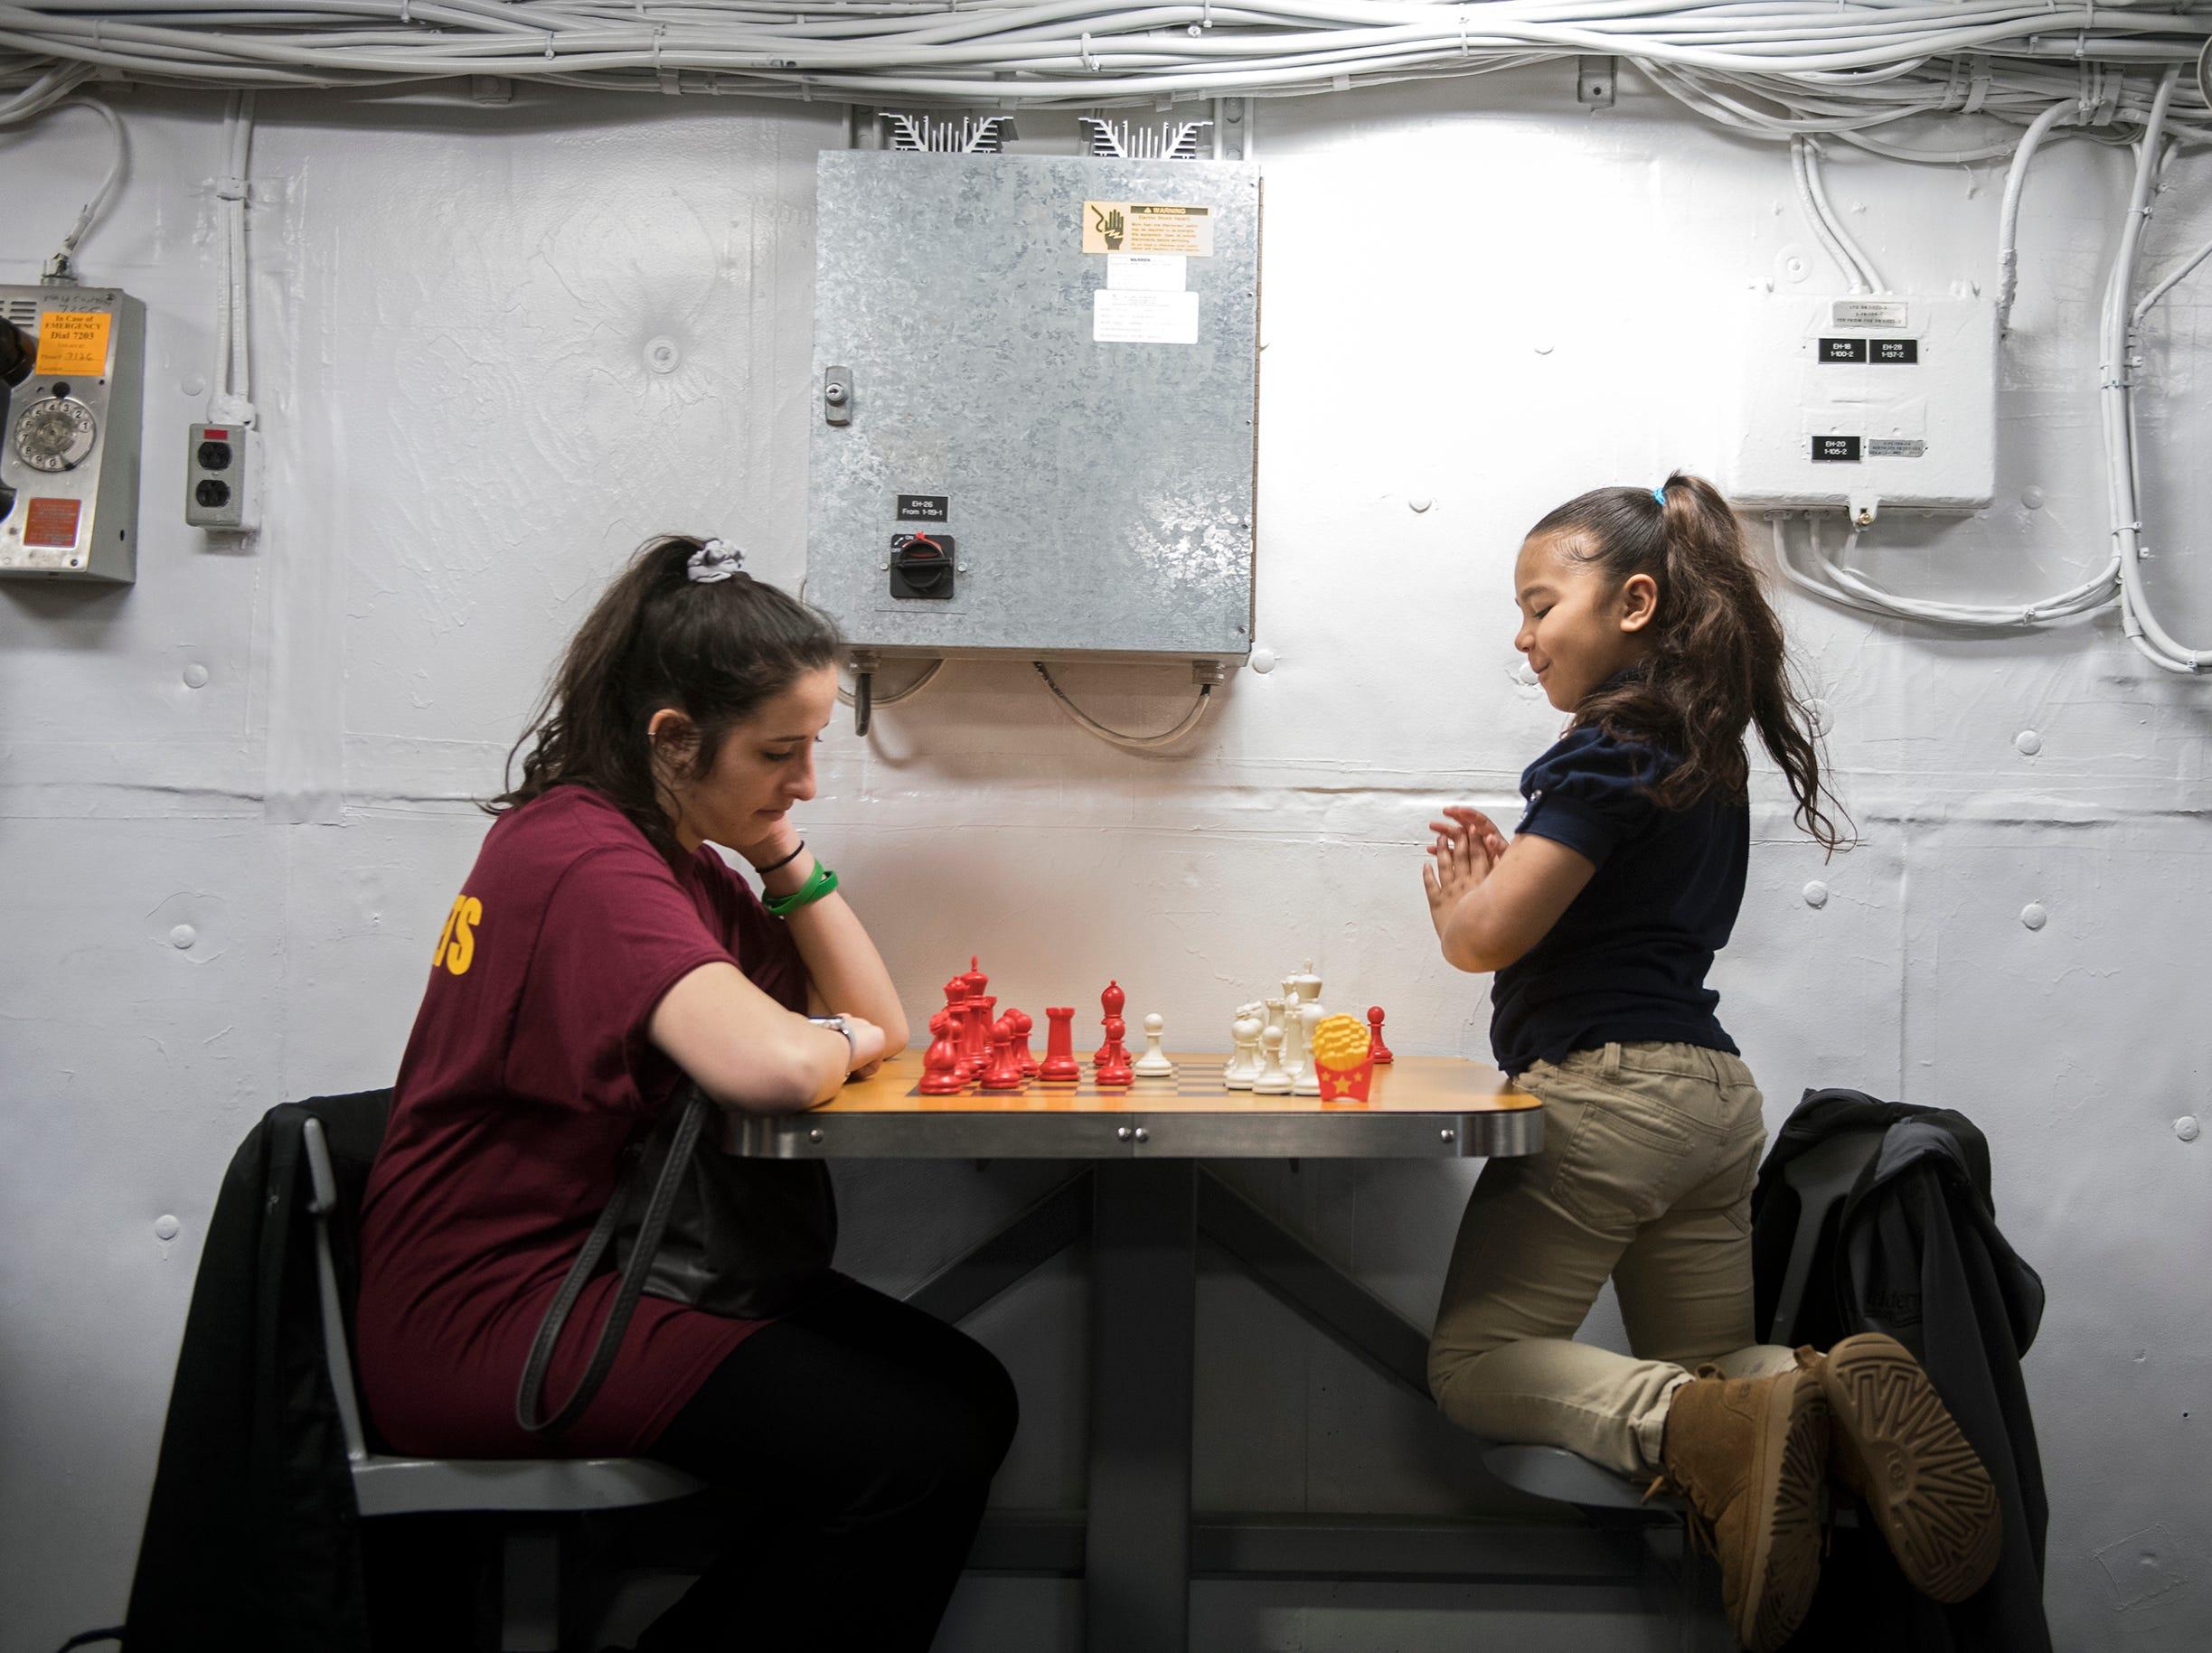 Student teacher Samantha Pagnani, left, and Oj'lynn Rivera, 5, play chess inside Jason's Kids Kompartment Thursday, March 21, 2019 aboard the USS New Jersey battleship in Camden, N.J.